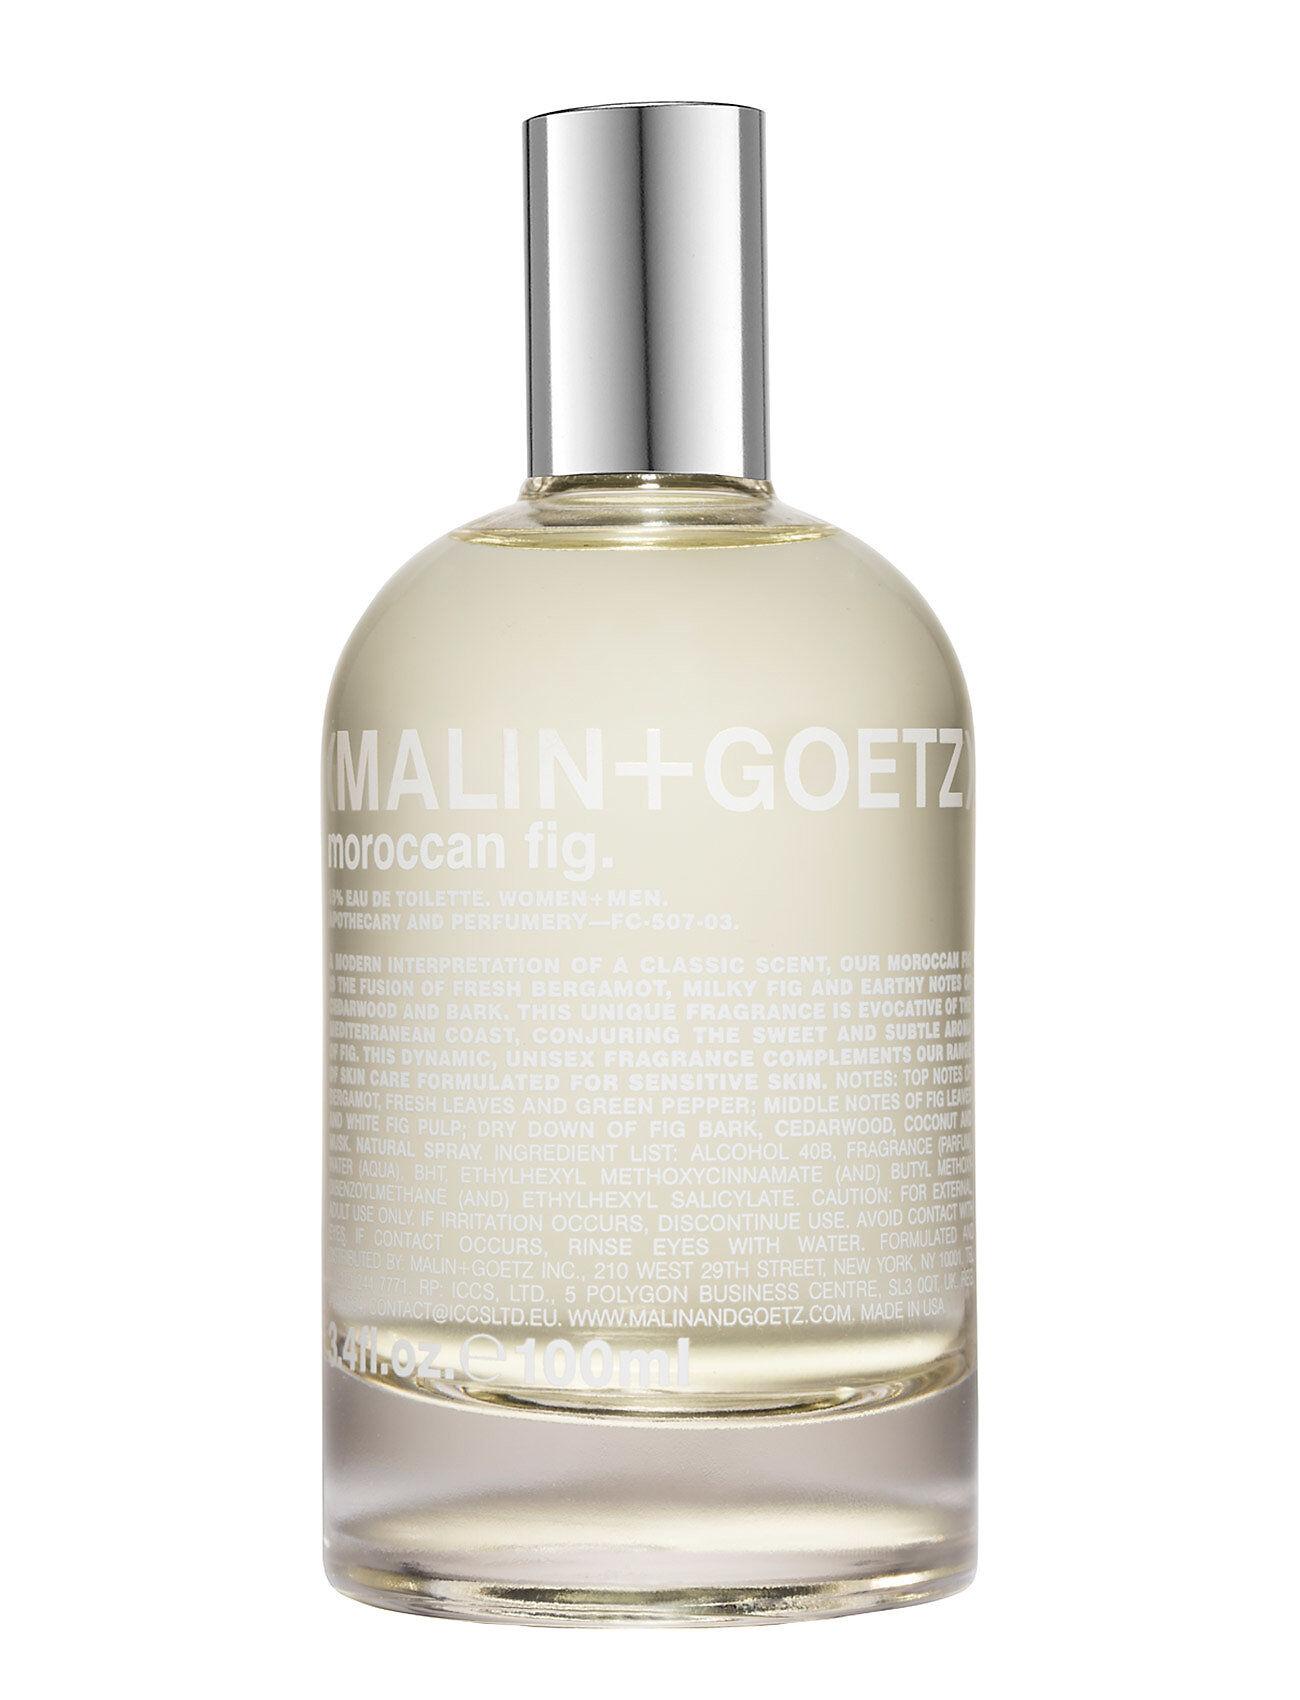 MALIN+GOETZ Moroccan Fig Eau De Toilette Hajuvesi Eau De Parfum Nude MALIN+GOETZ